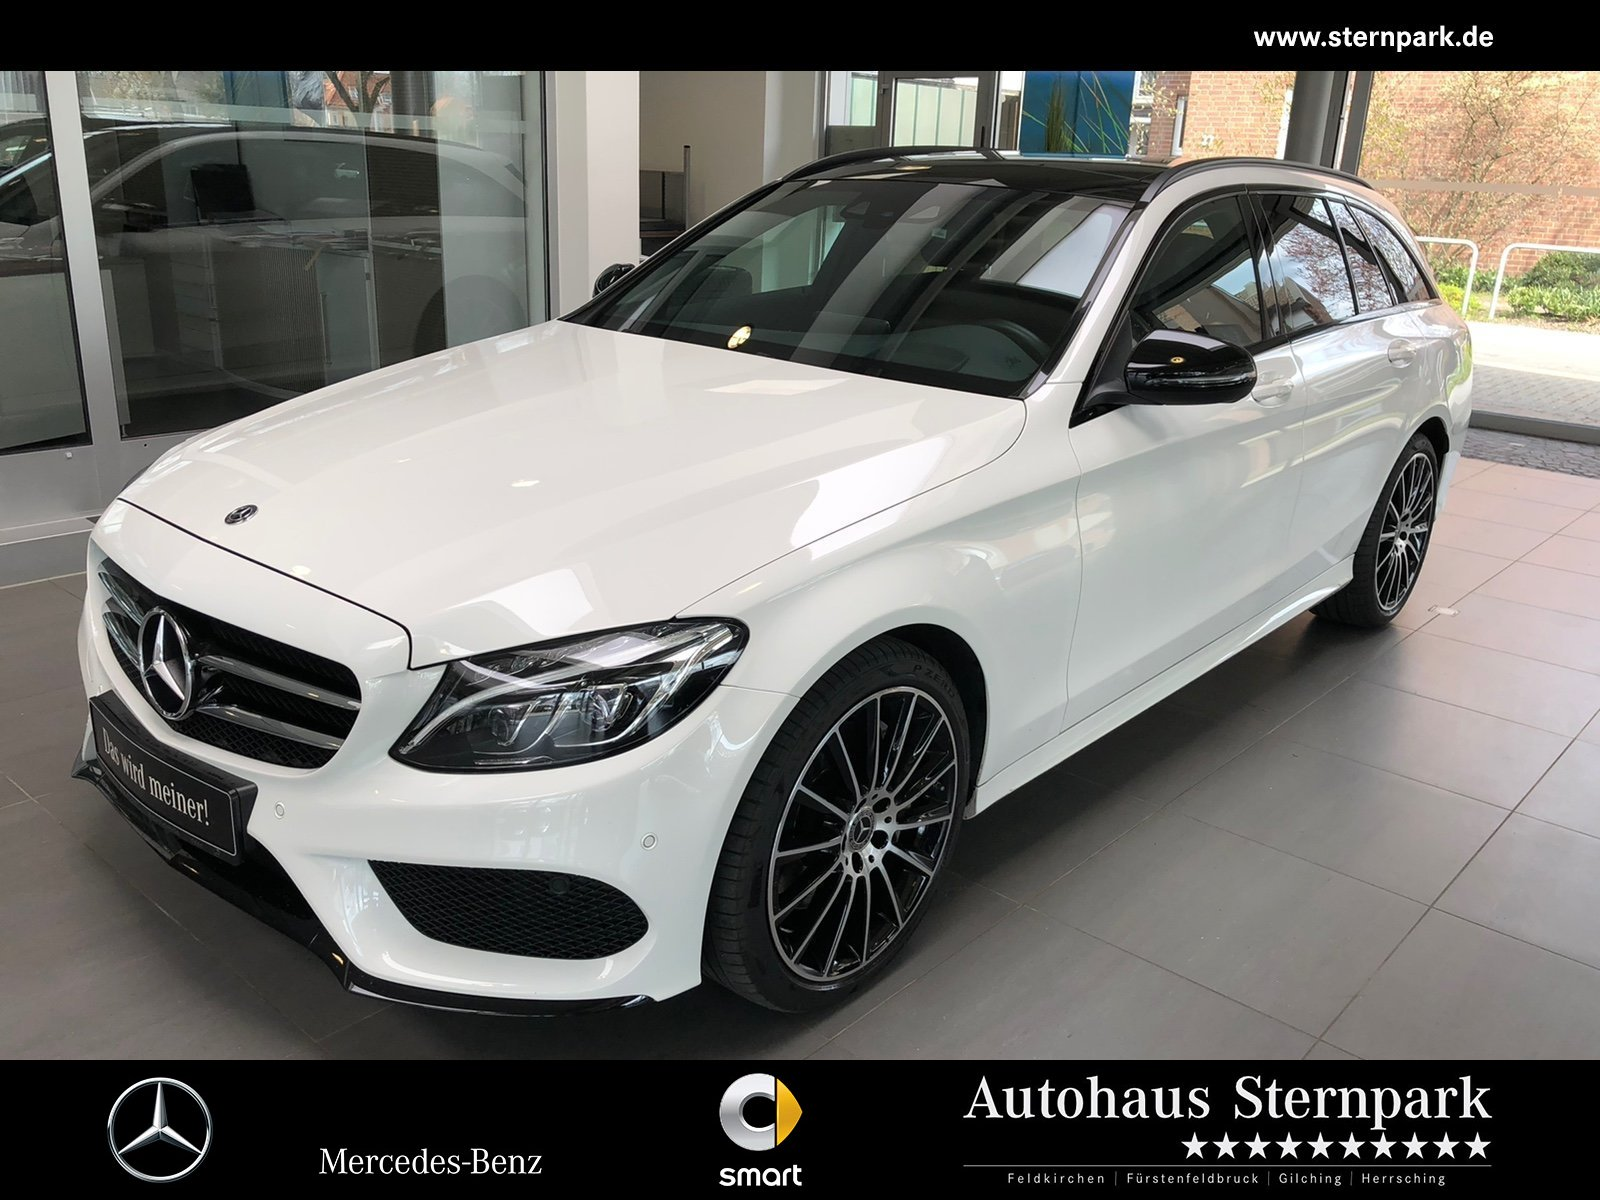 Mercedes-Benz C 400 4M T AMG Pano+HeadUp+Comand+AHK+MULTIBEAM+, Jahr 2018, Benzin